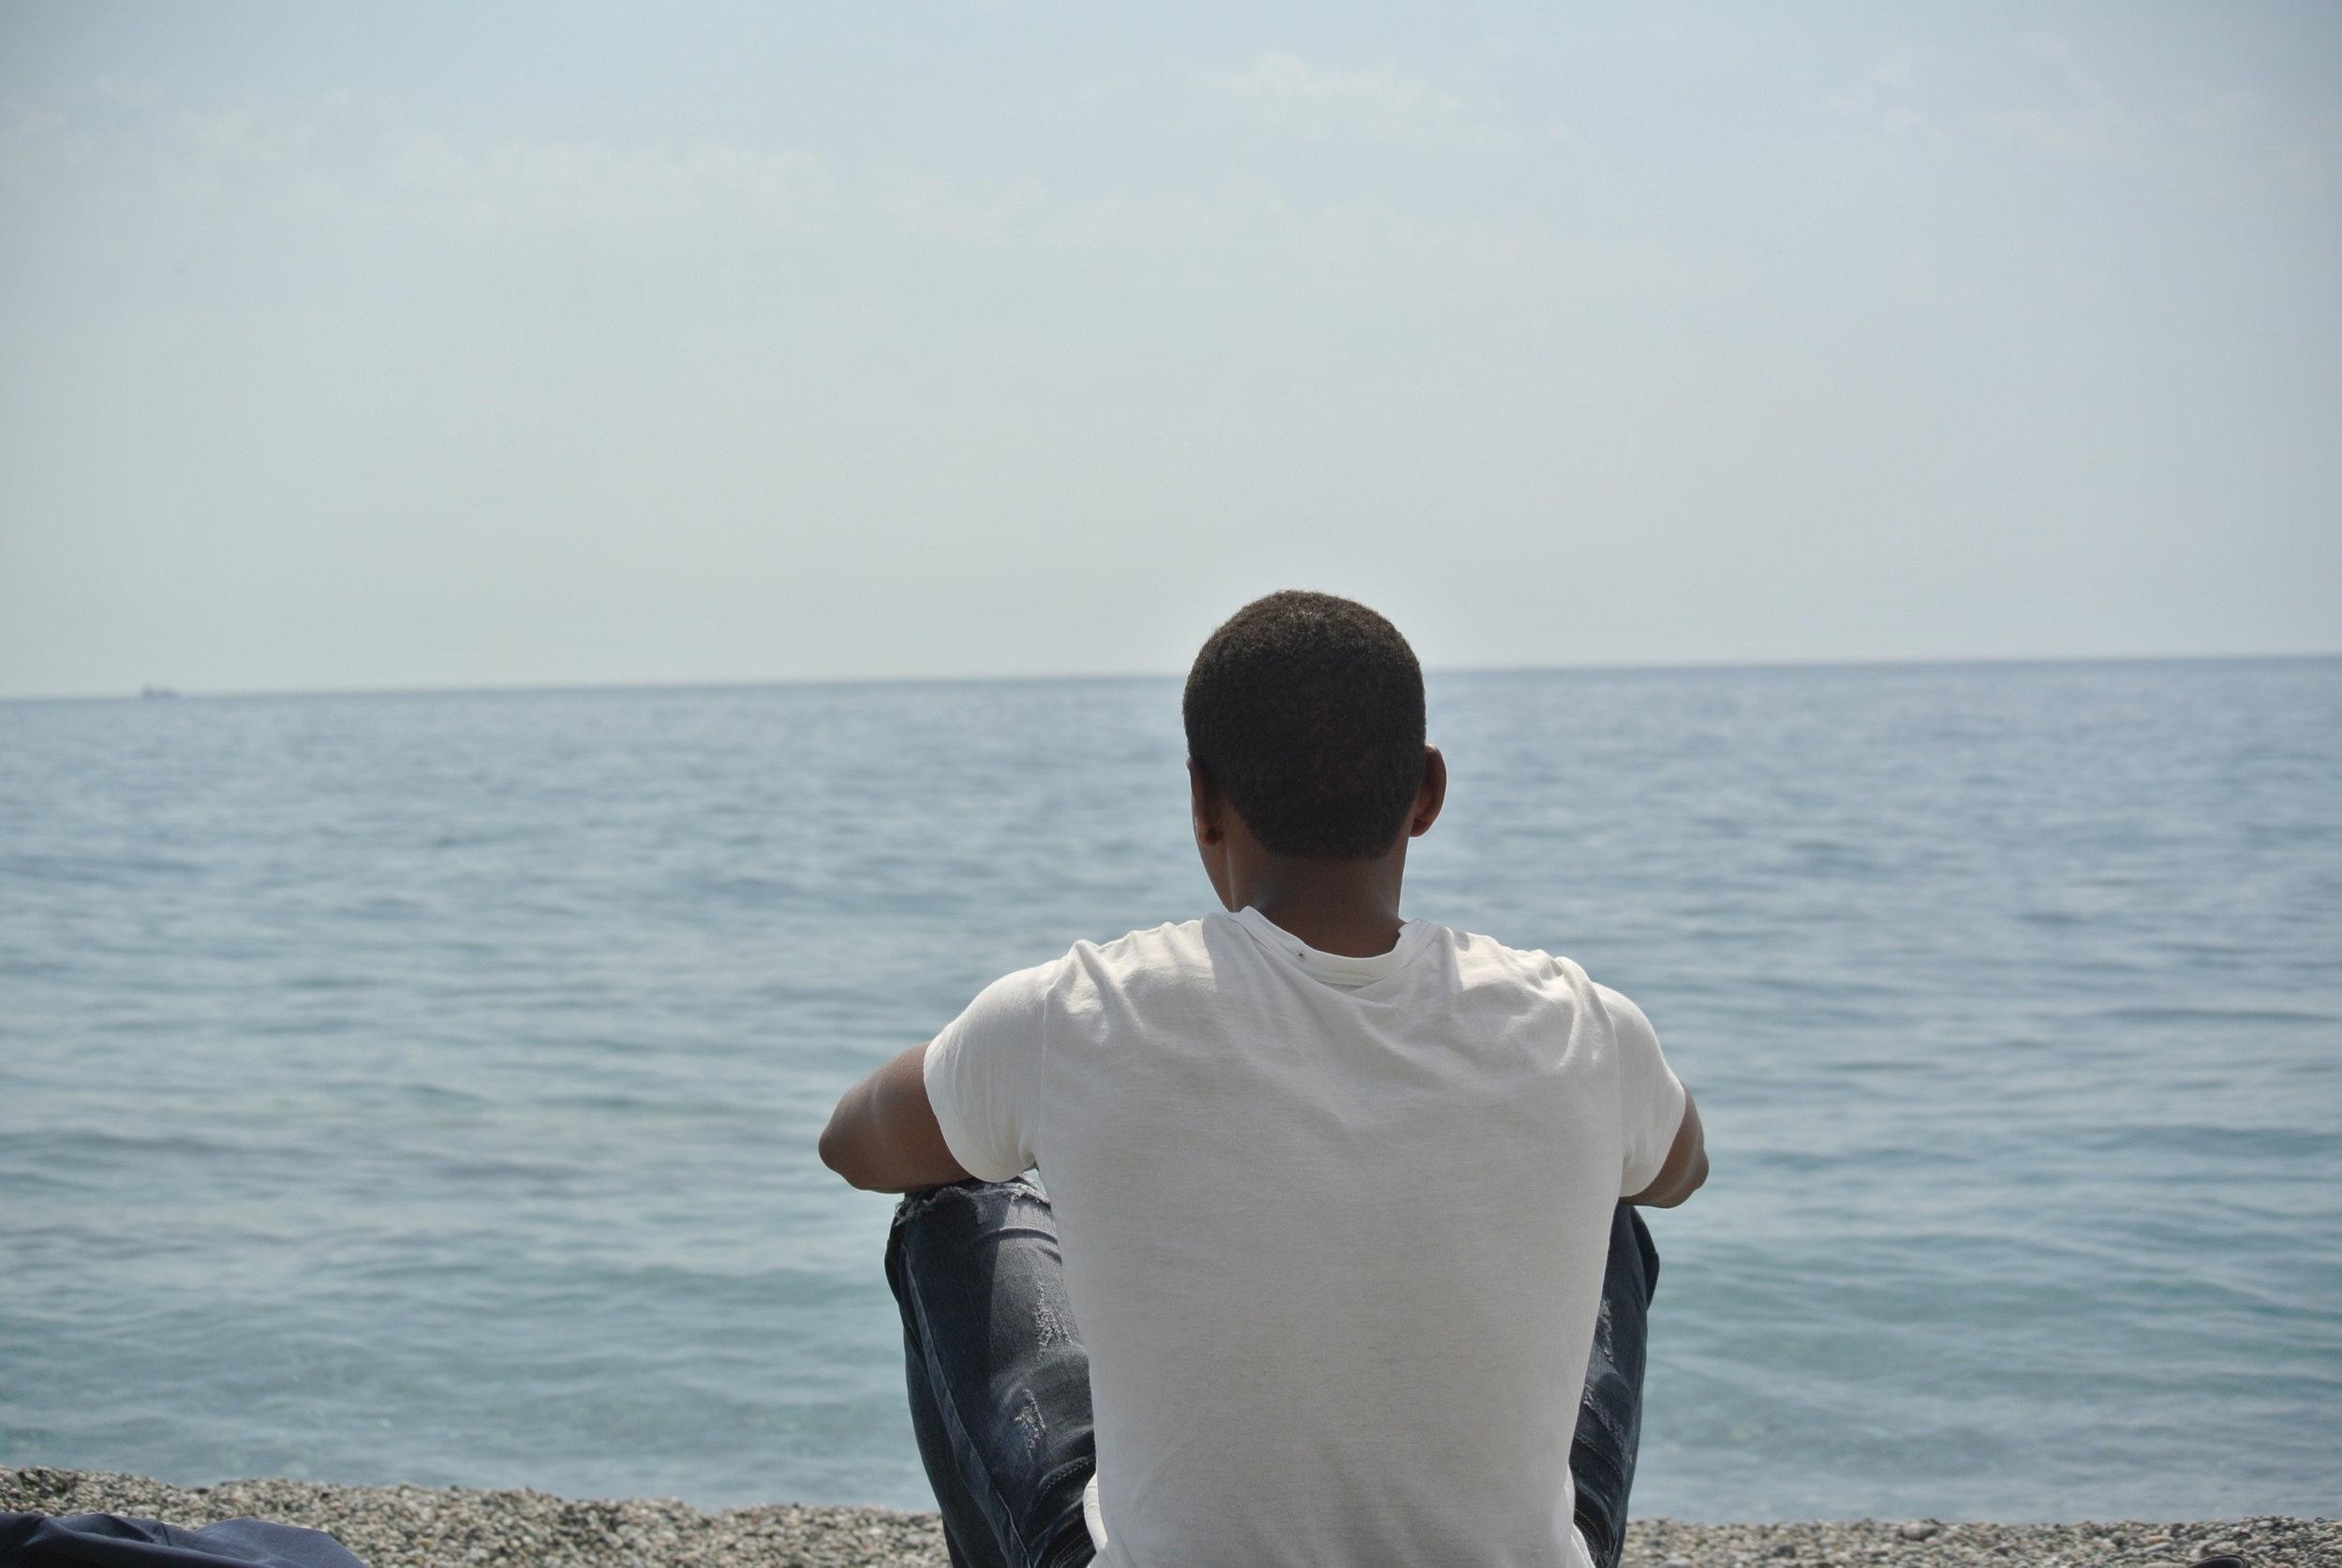 Staring at the sea. Longobardi, Italy; May 2018. ©Pamela Kerpius